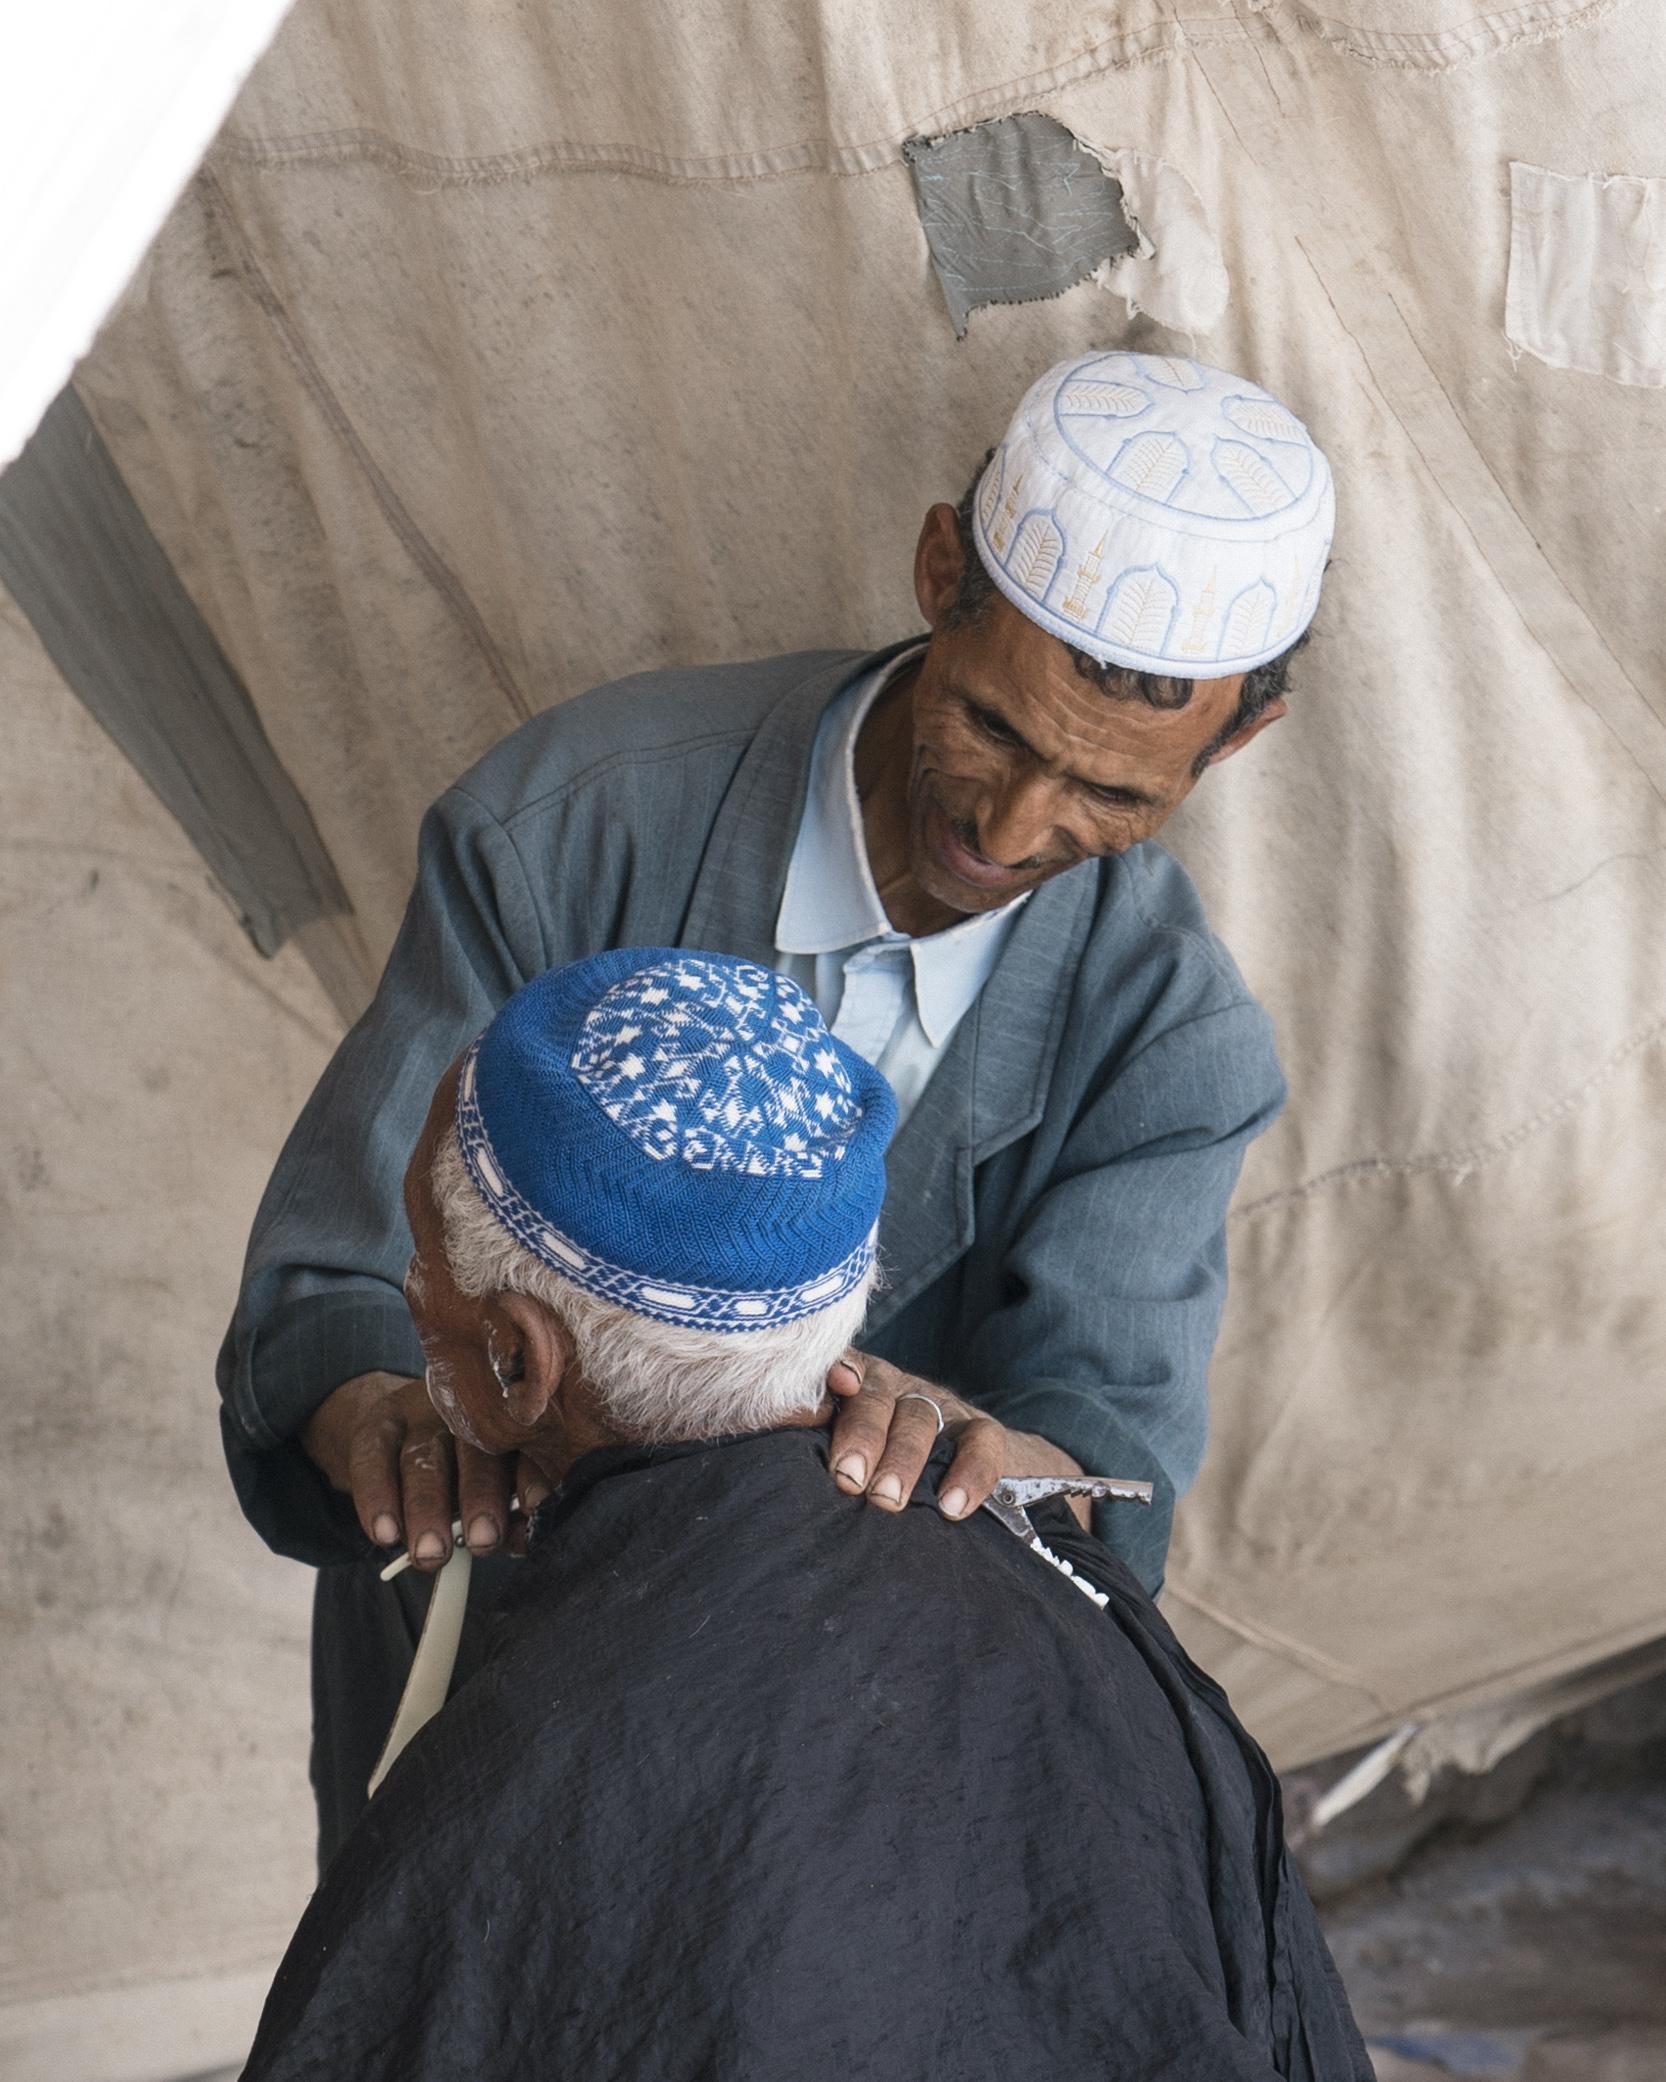 Barbermangrain02.jpg